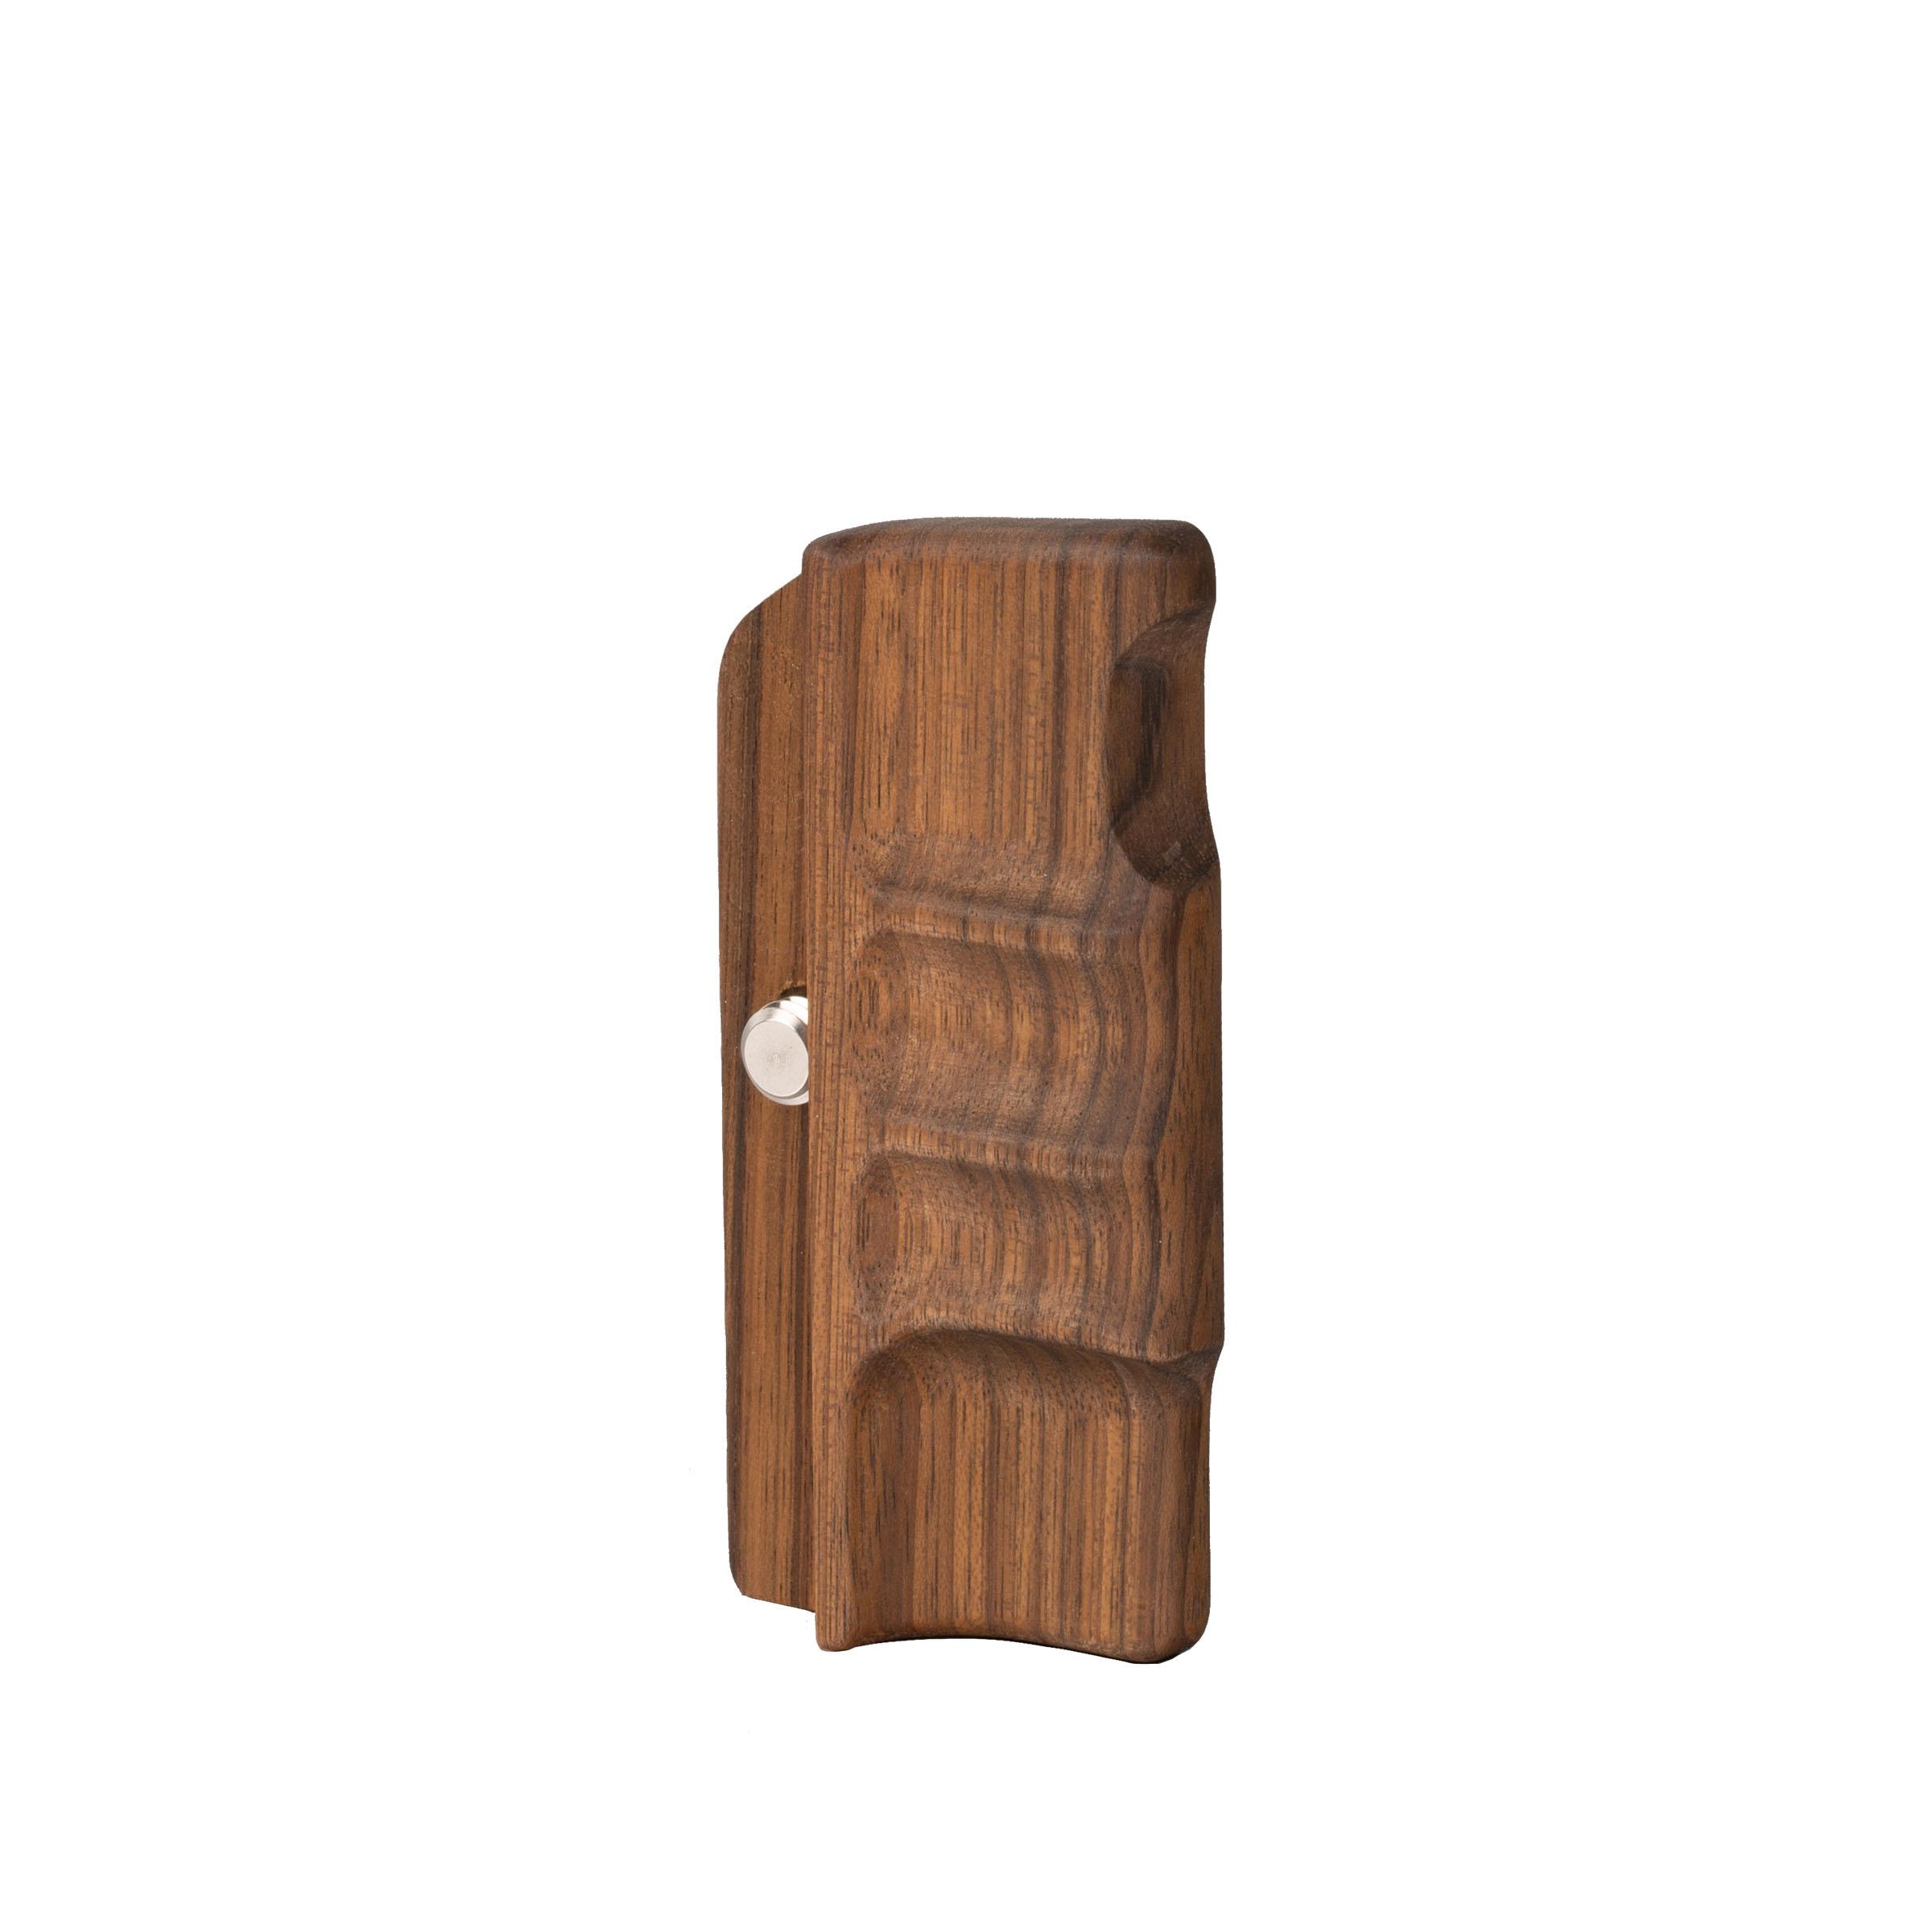 ALPA PLUS handgrip left, rosewood natural